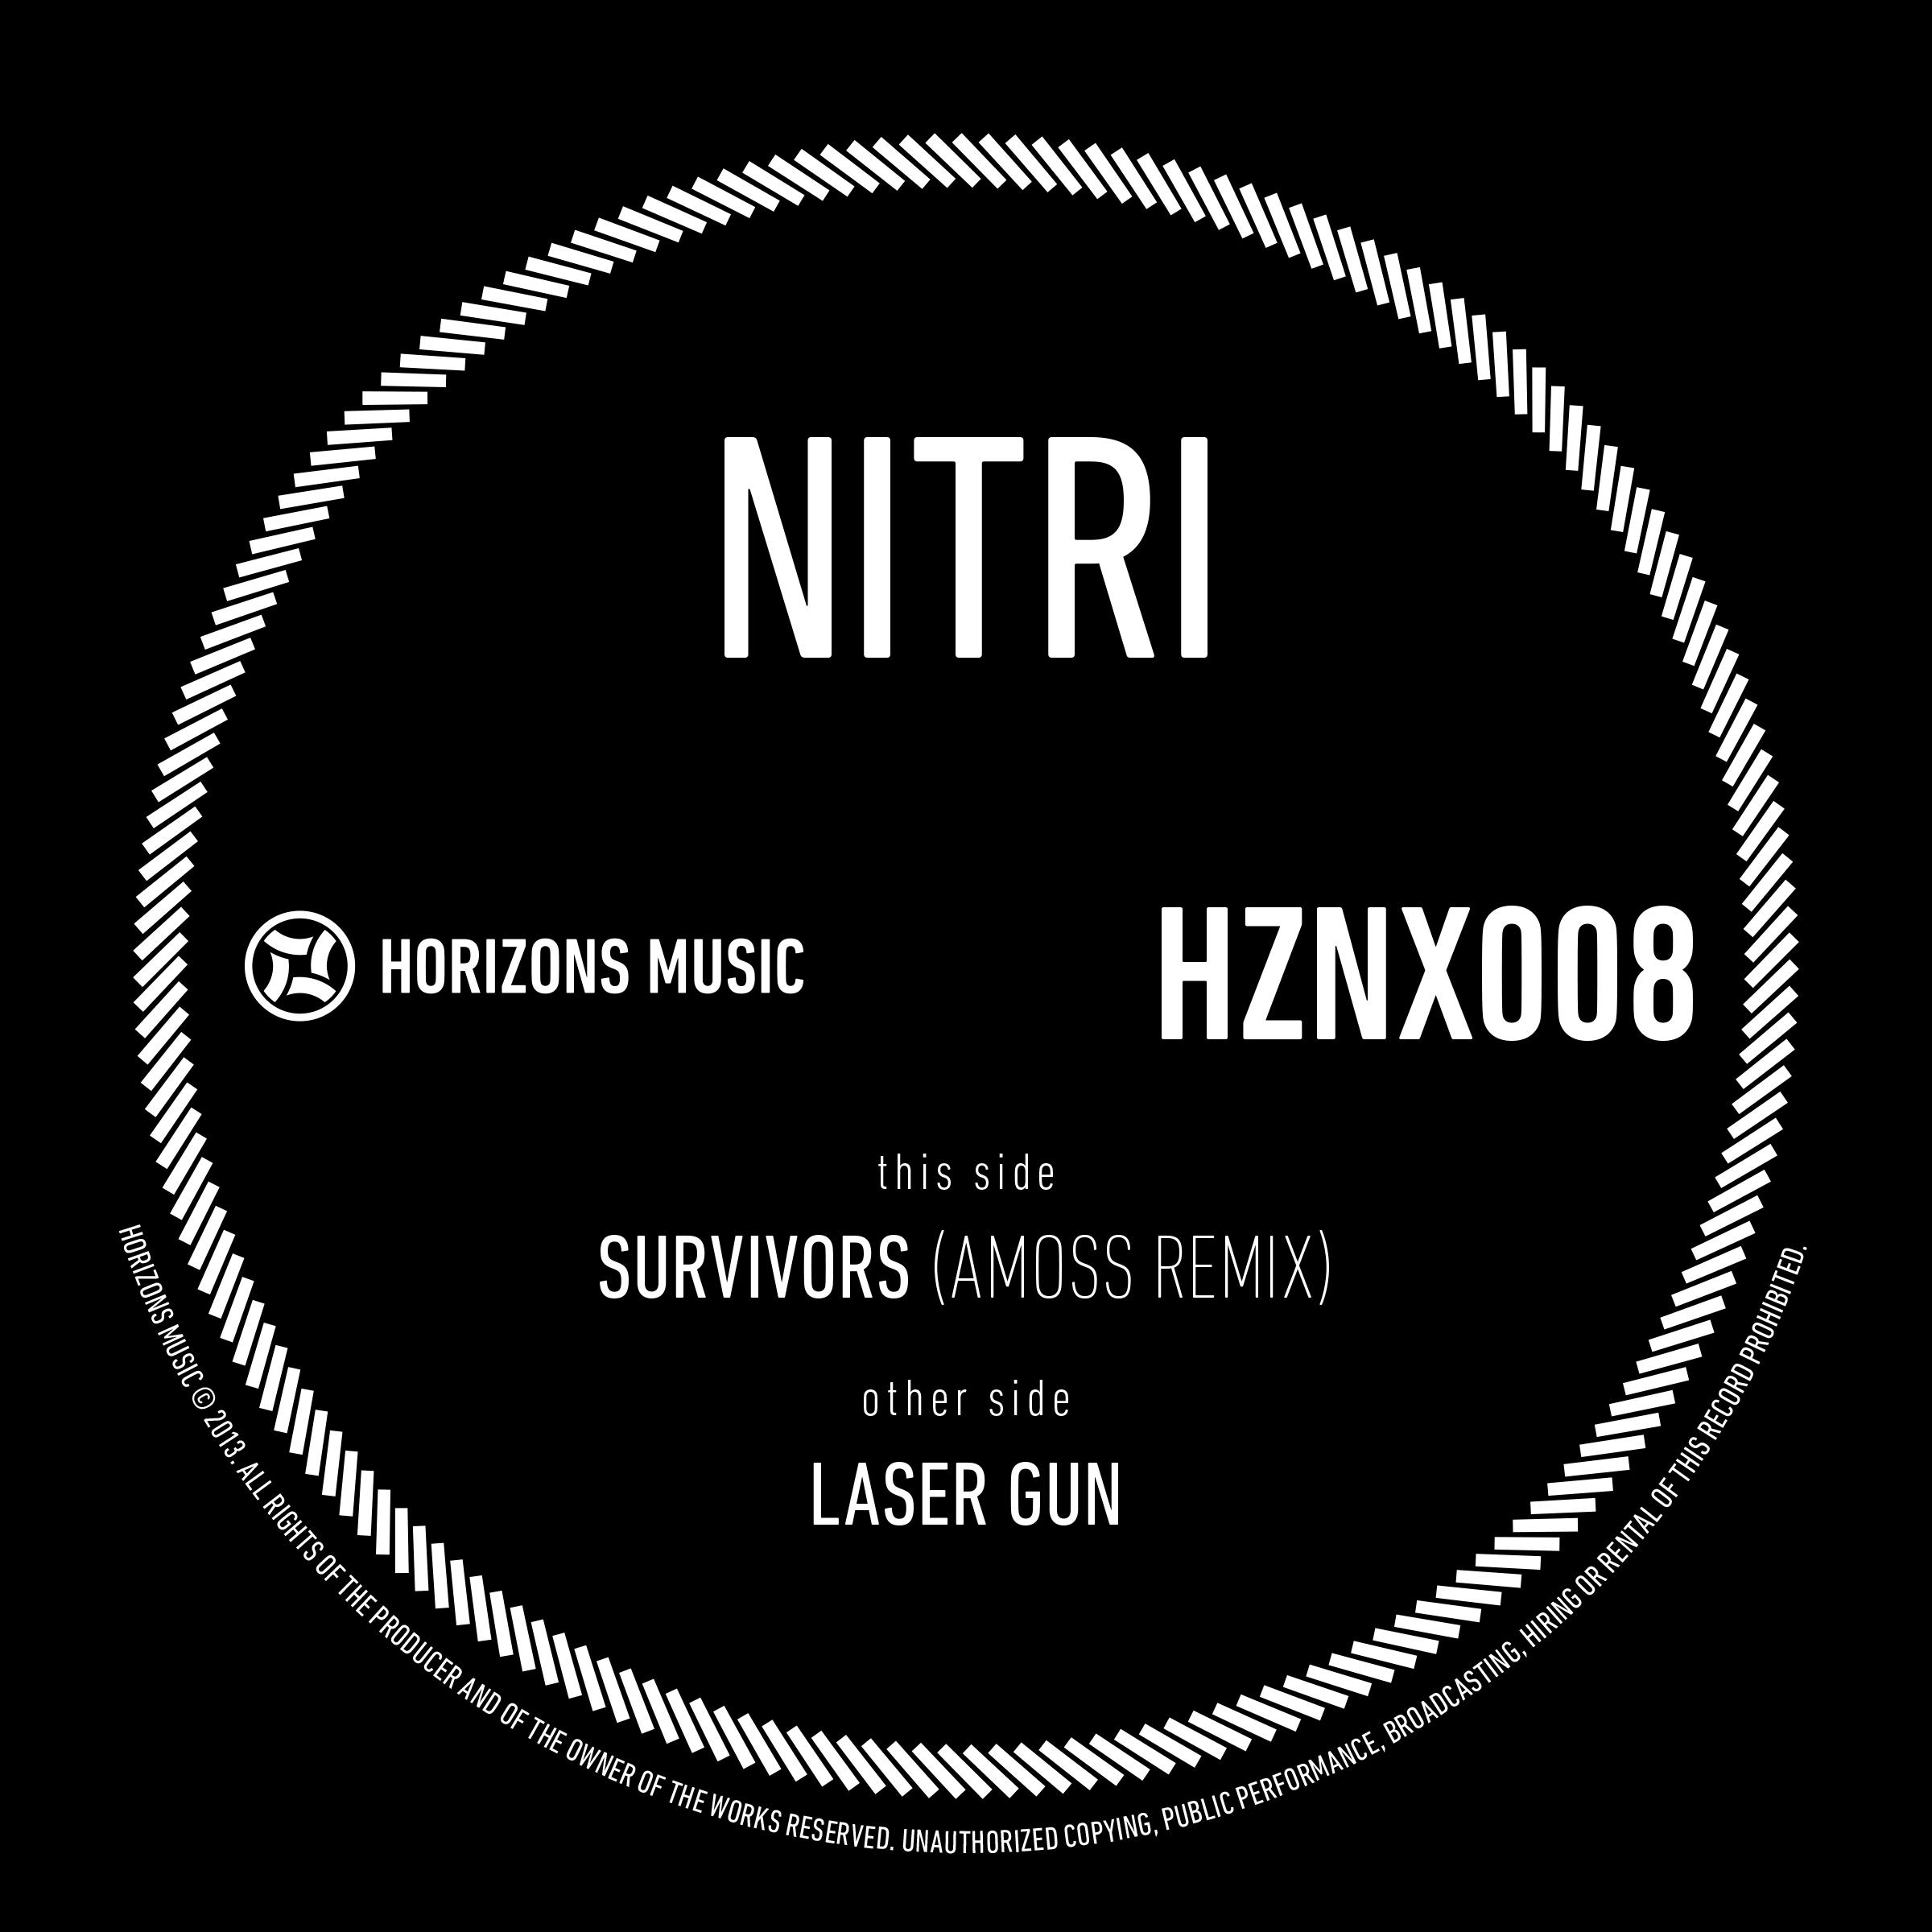 "Nitri/SURVIVORS (AMOSS REMIX) 12"""